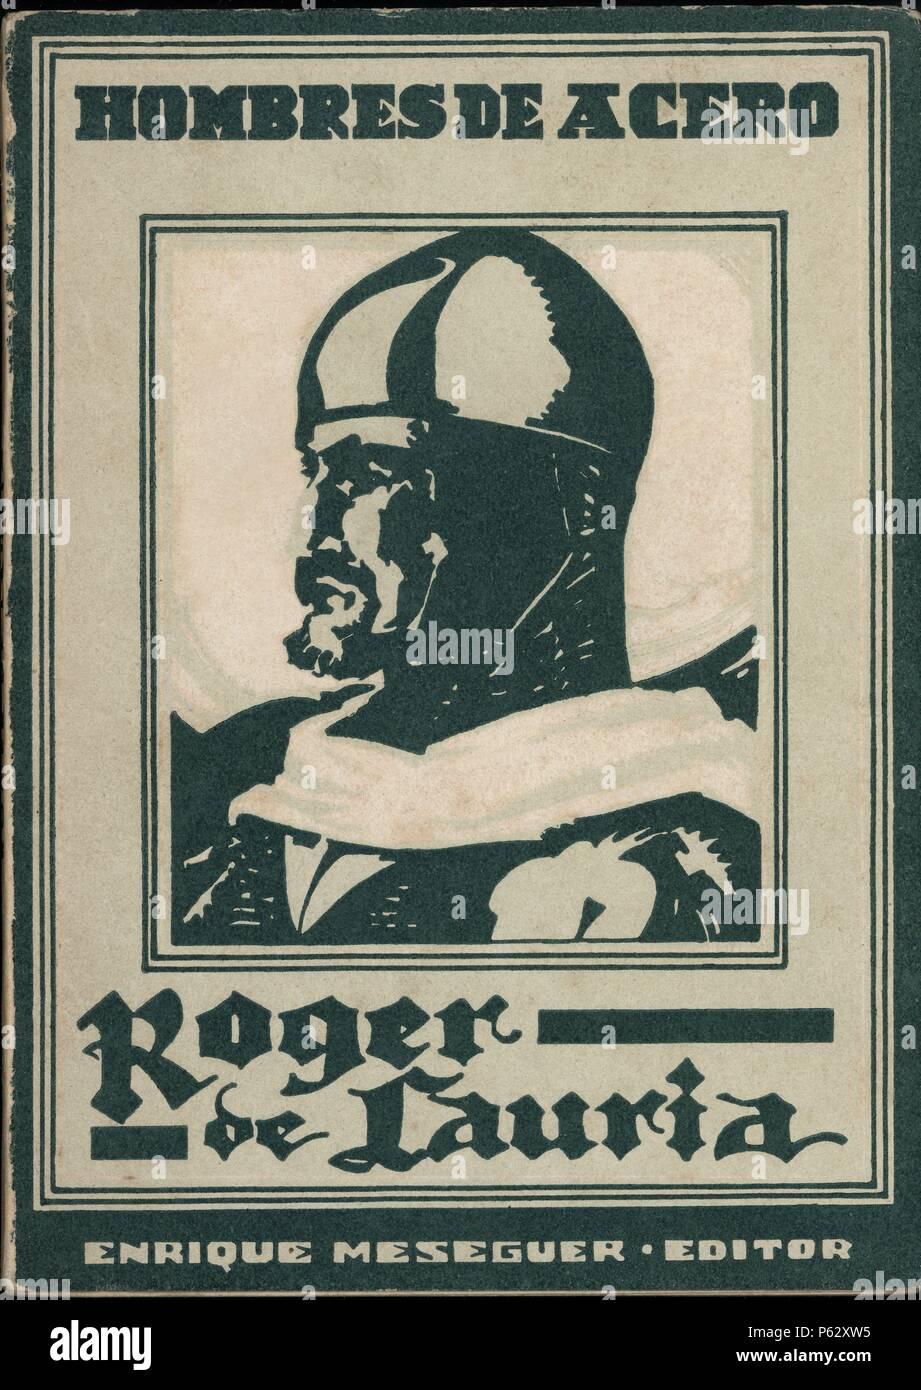 Portada del libro 'Hombres de Acero. Roger de Lauria', por M. J. Quintana. Barcelona, 1943. - Stock Image